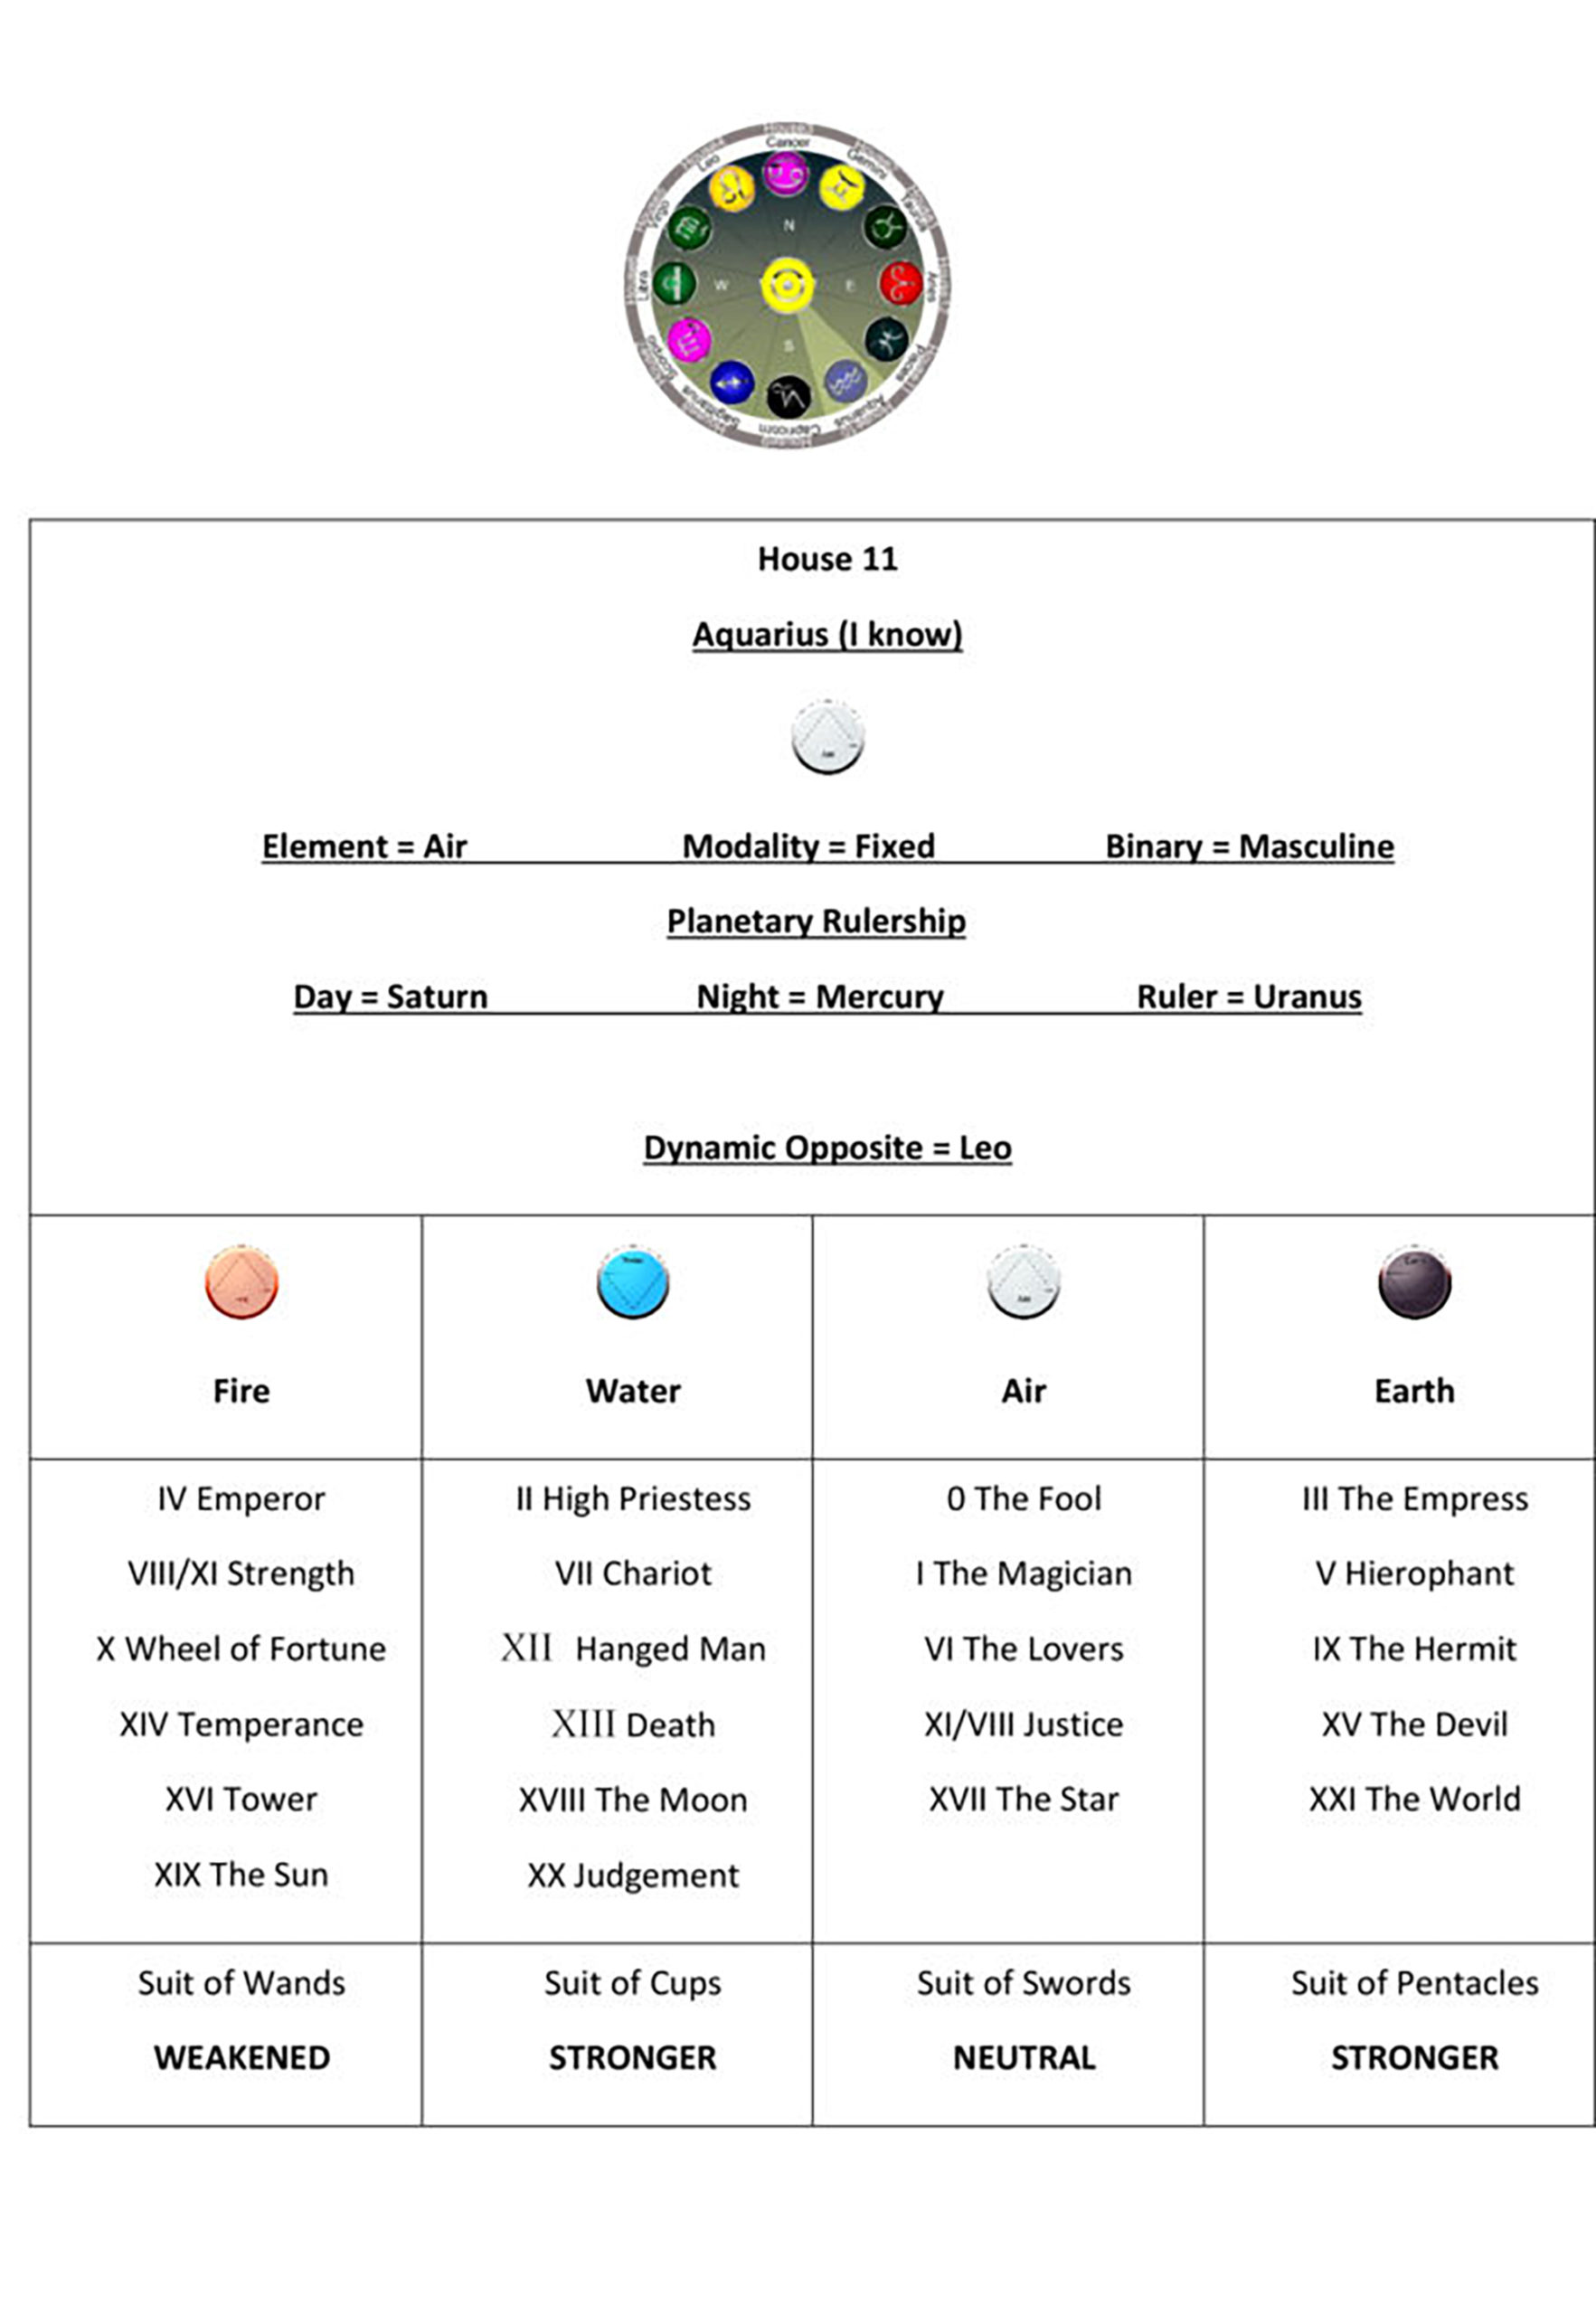 Astrology House 11 Chart1